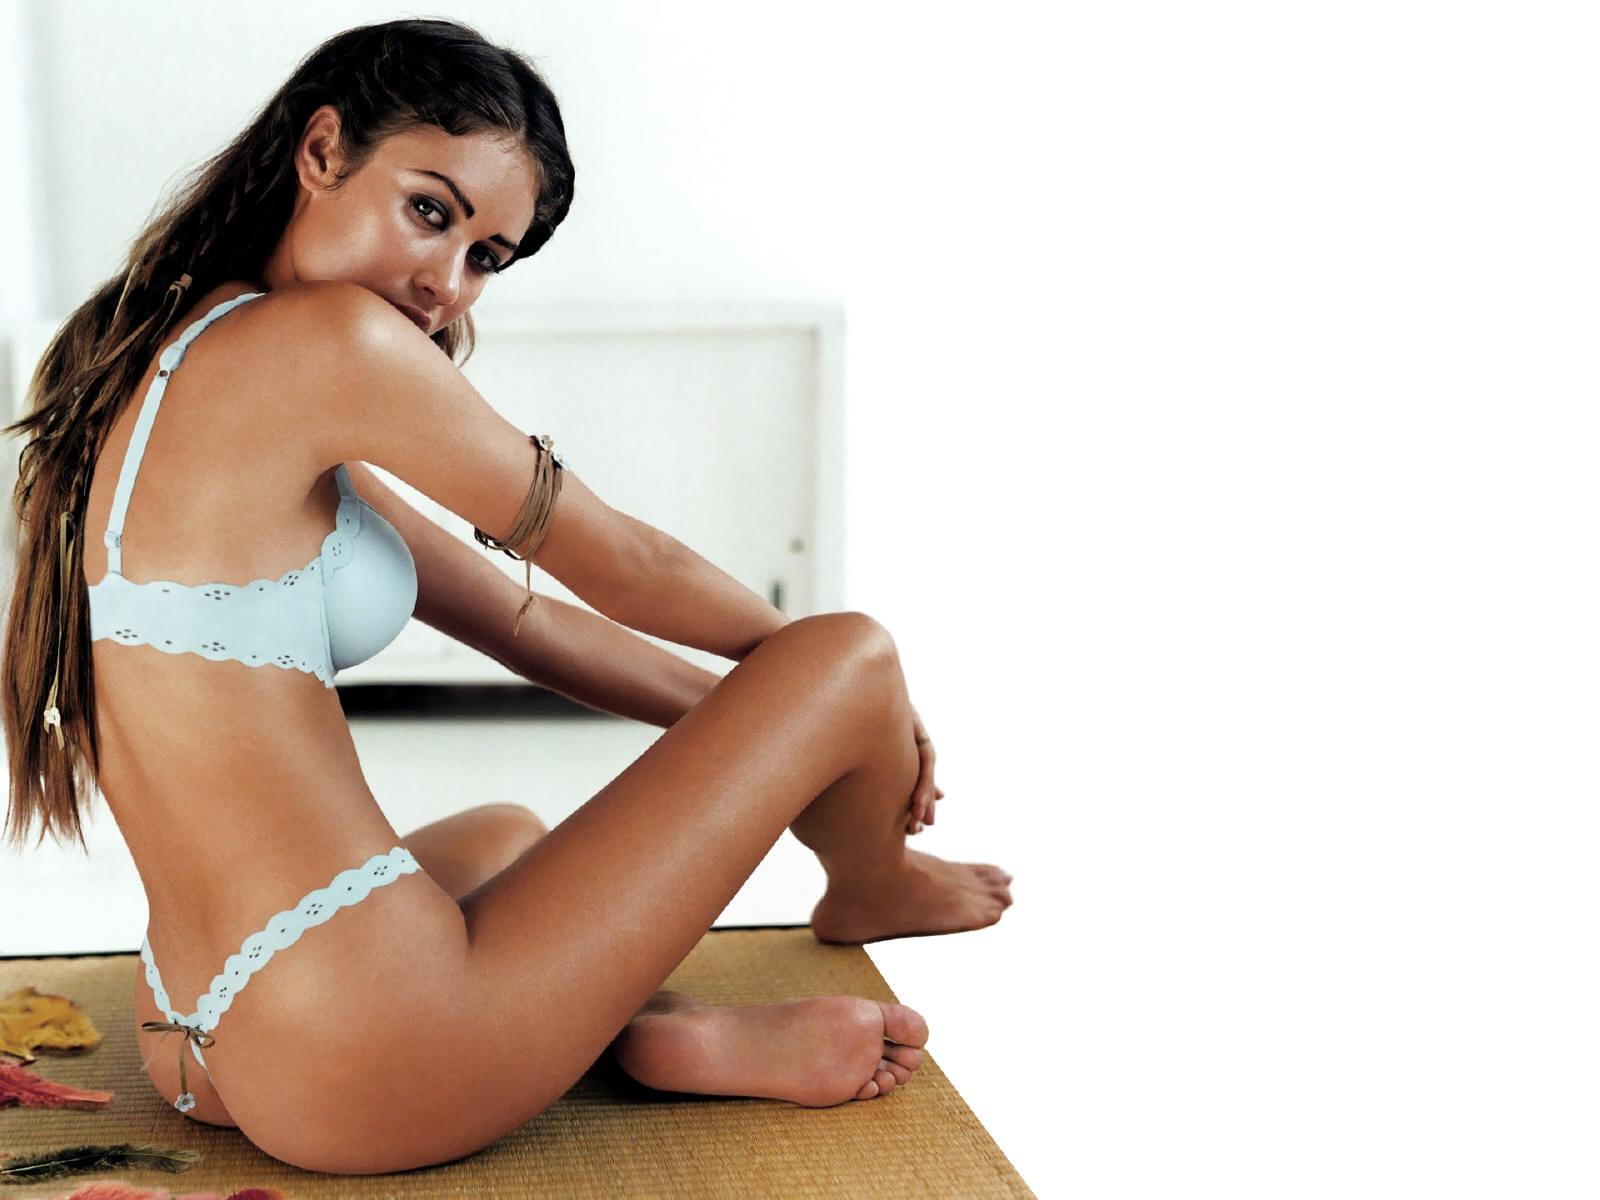 http://2.bp.blogspot.com/-y0XQrz5O5Z0/TZUJ733XmvI/AAAAAAAAAEA/-CWJ-3m7jrY/s1600/lemadesu.blogspot.com--04-best-top-desktop-hot-celebrity-girl-olga-kurylenko-sexy-lingerie-wallpapers-hd.jpg